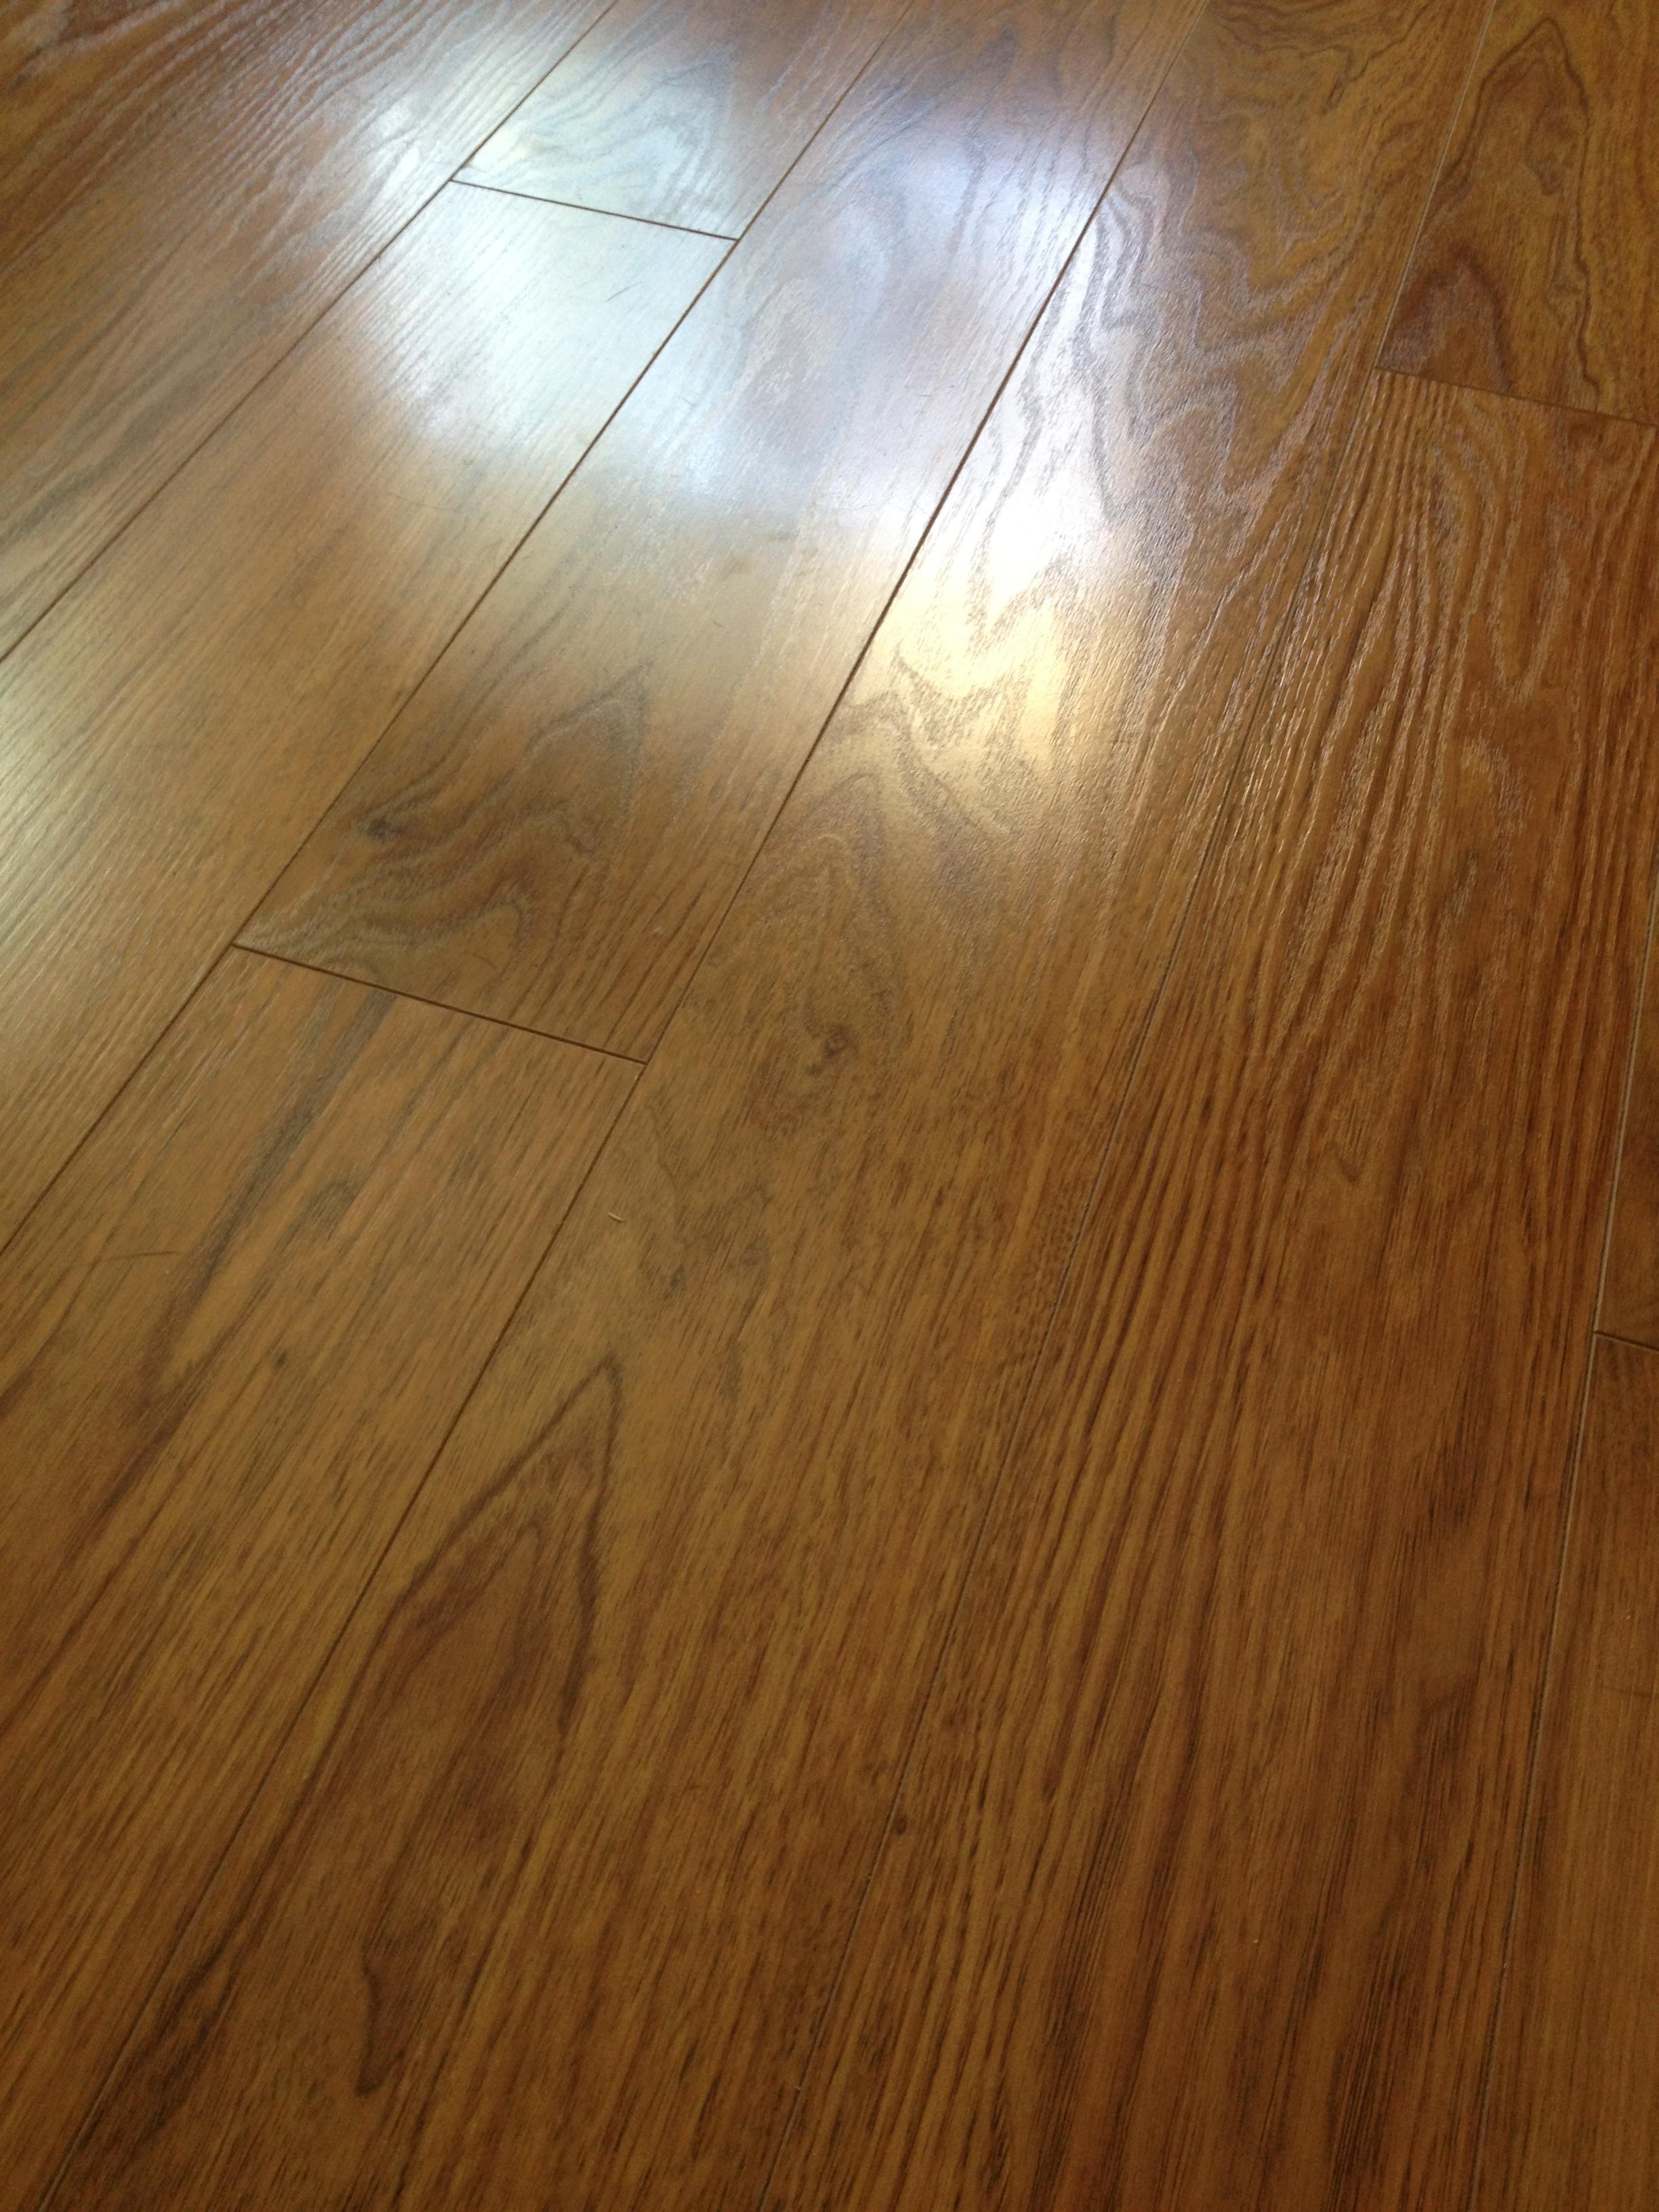 Bedroom how to pergo laminate flooring courtney 39 s - How long does laminate flooring last ...